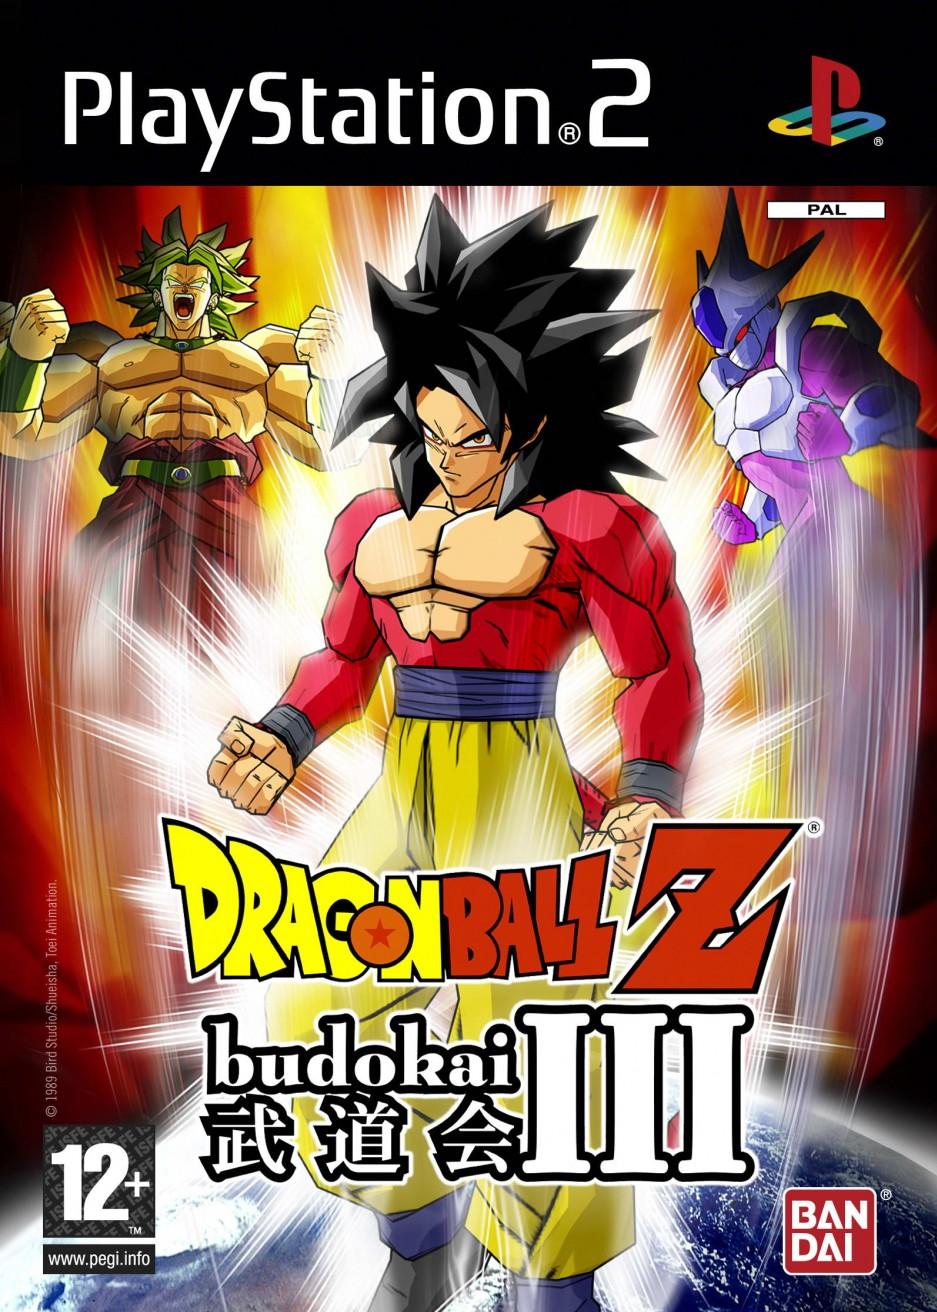 DragonBallZBudokaiIII PS2 Jaquette 001